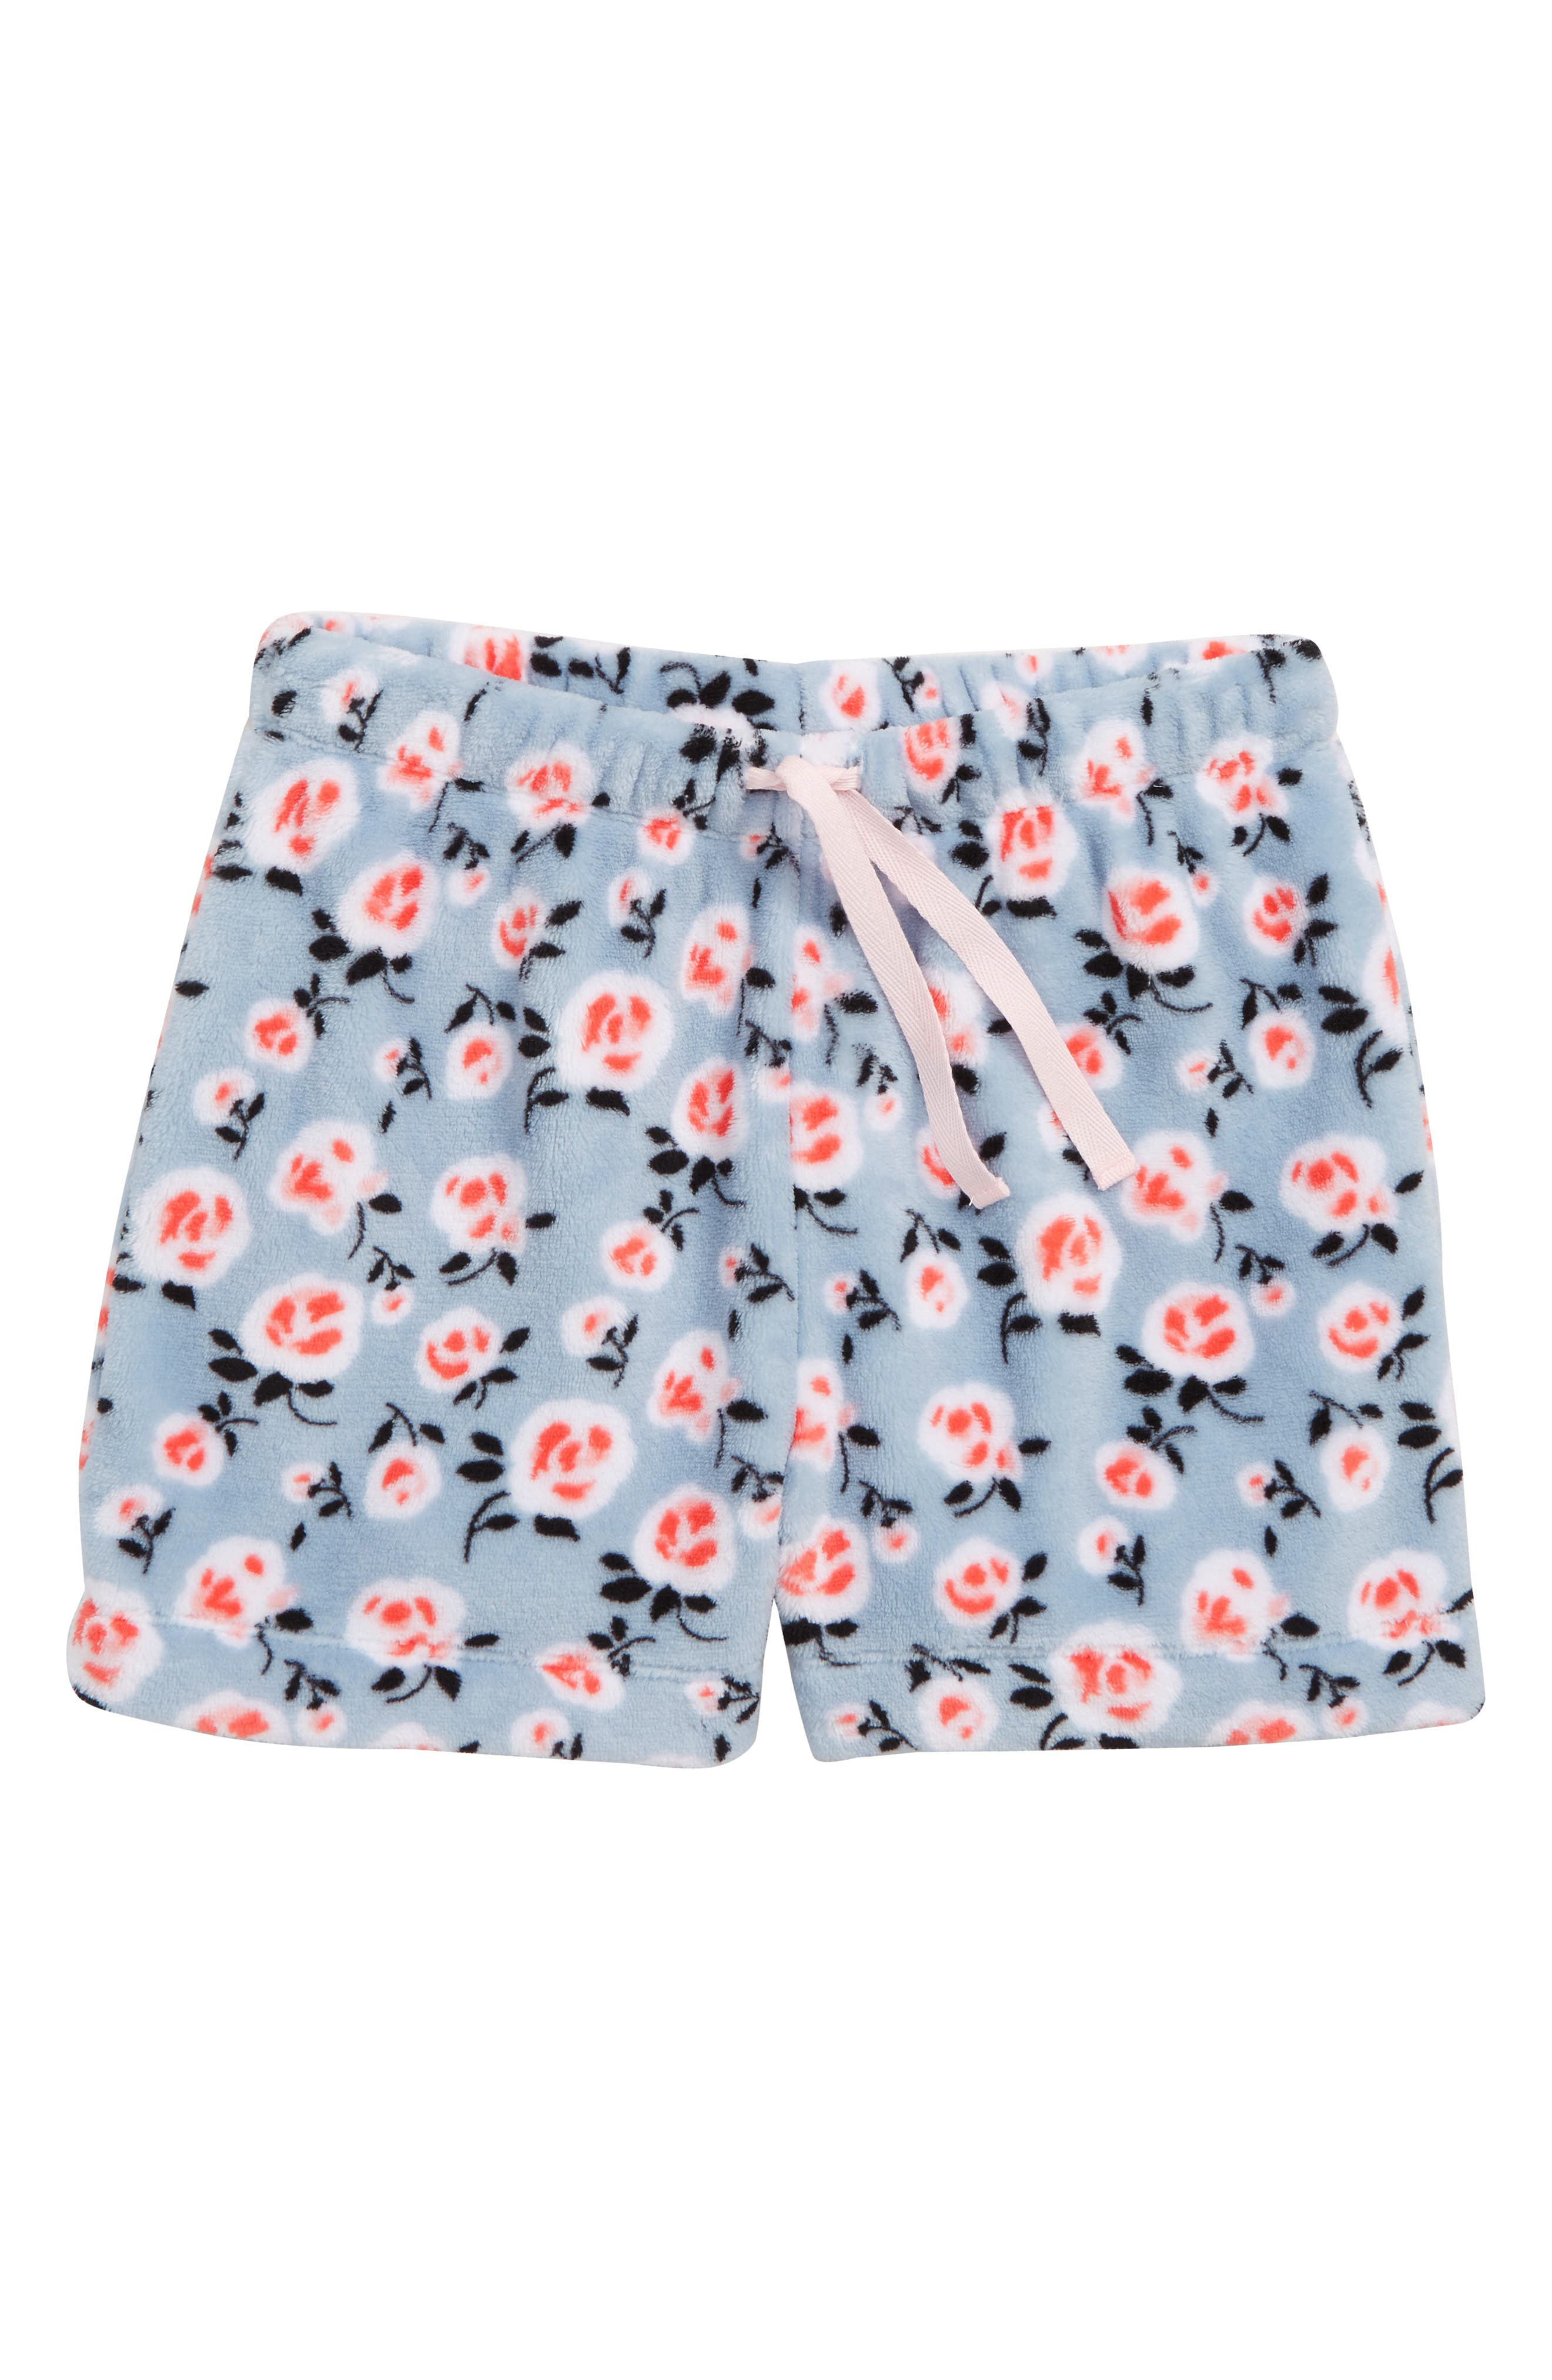 Fleece Sleep Shorts,                             Main thumbnail 1, color,                             BLUE CELESTIAL LOVELY FLOWER